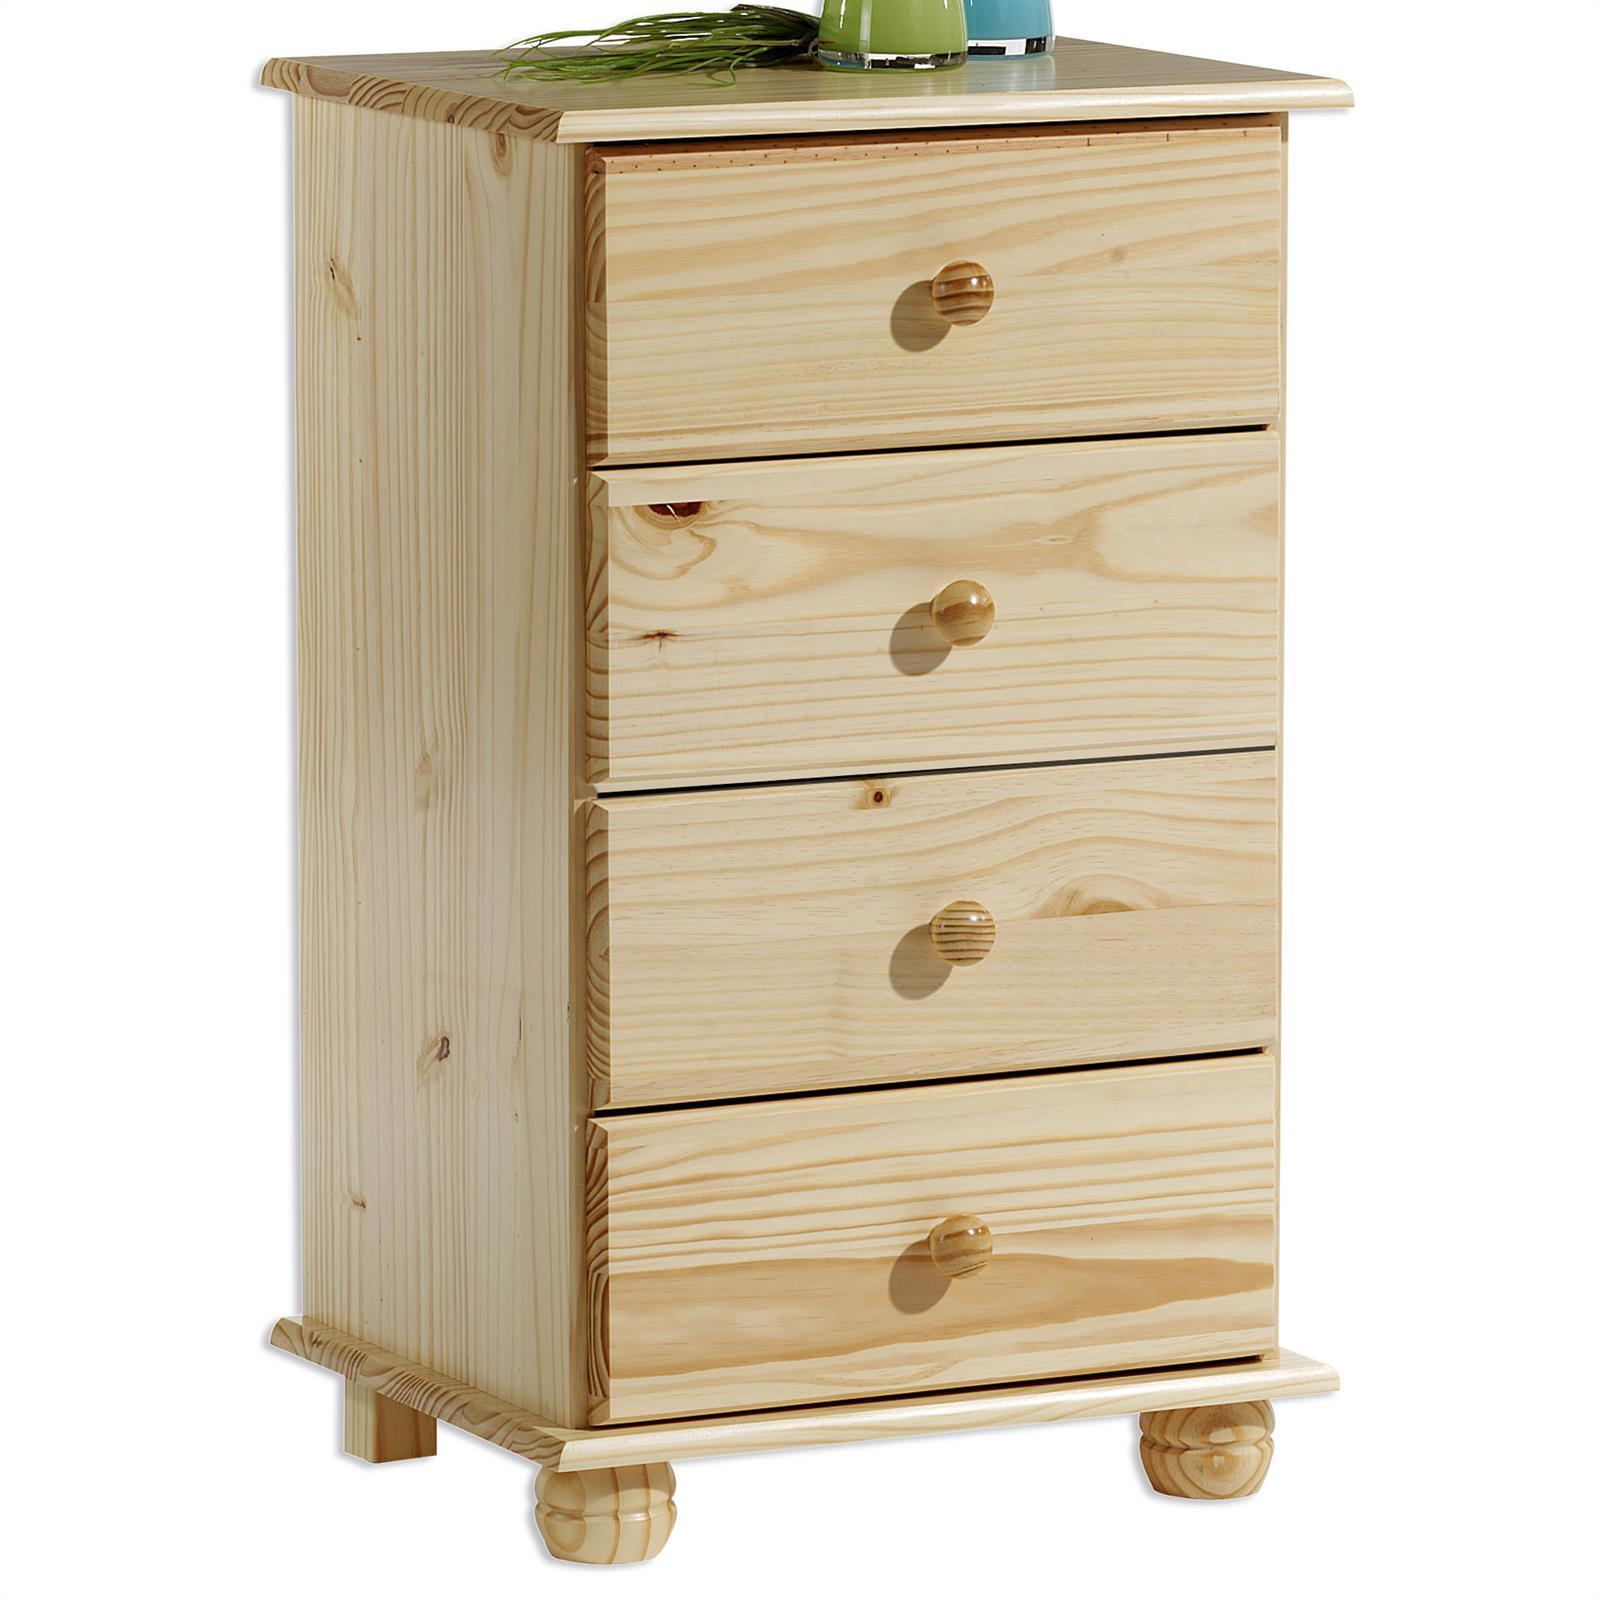 chiffonnier en pin bern 4 tiroirs vernis naturel. Black Bedroom Furniture Sets. Home Design Ideas